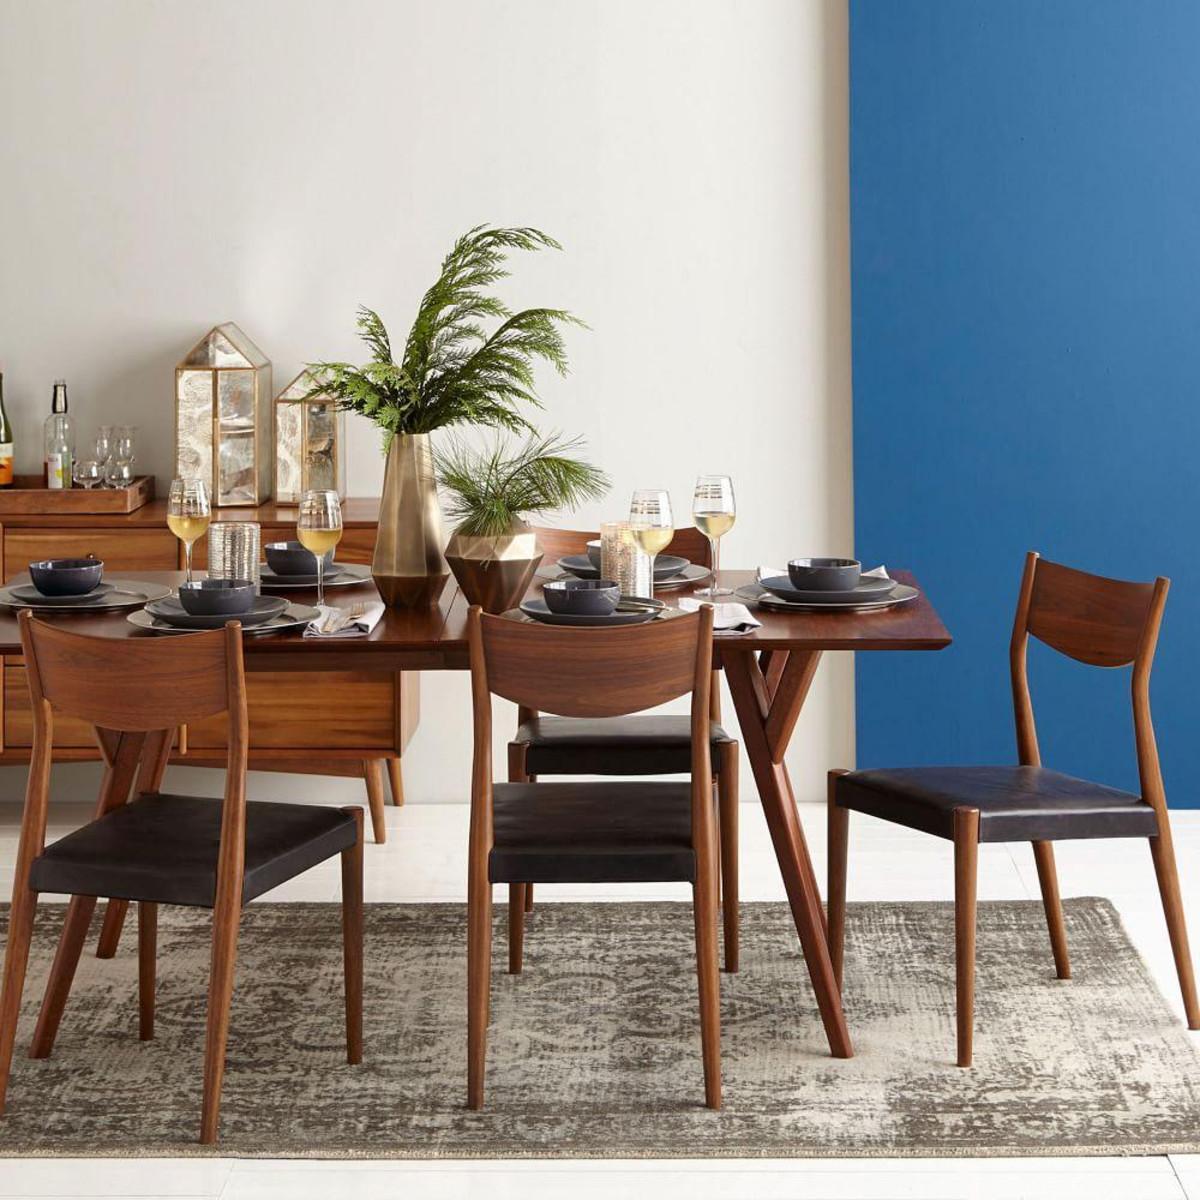 Best ideas about Mid Century Modern Dining Table . Save or Pin Mid Century Expandable Dining Table Walnut Now.